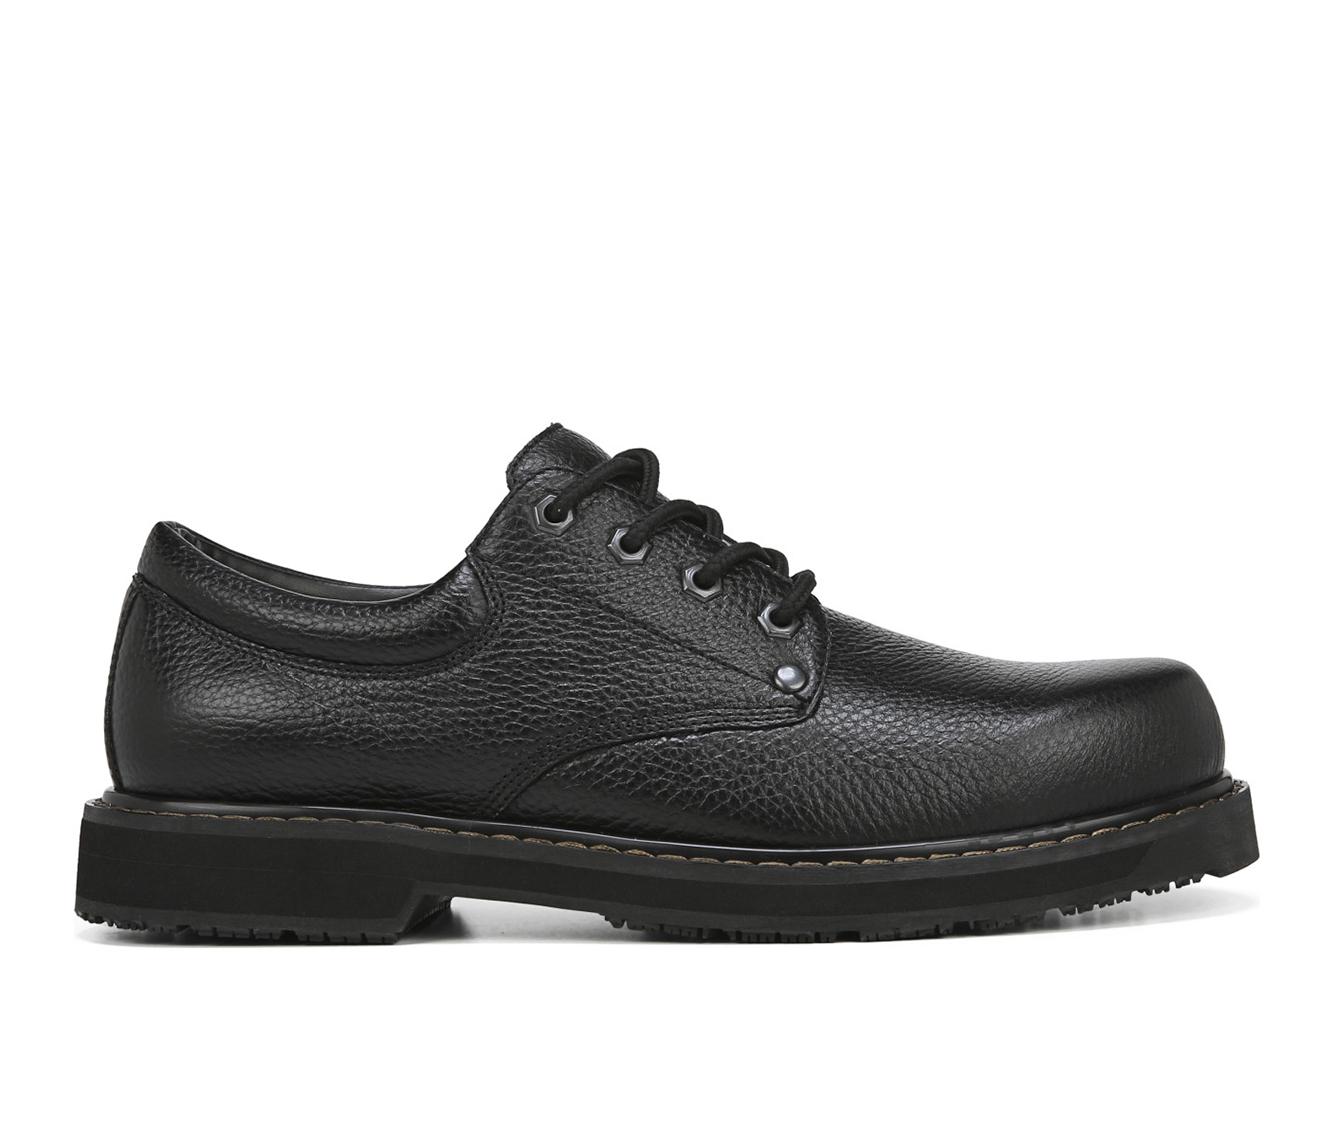 Dr. Scholls Harrington II Men's Boots (Black Leather)